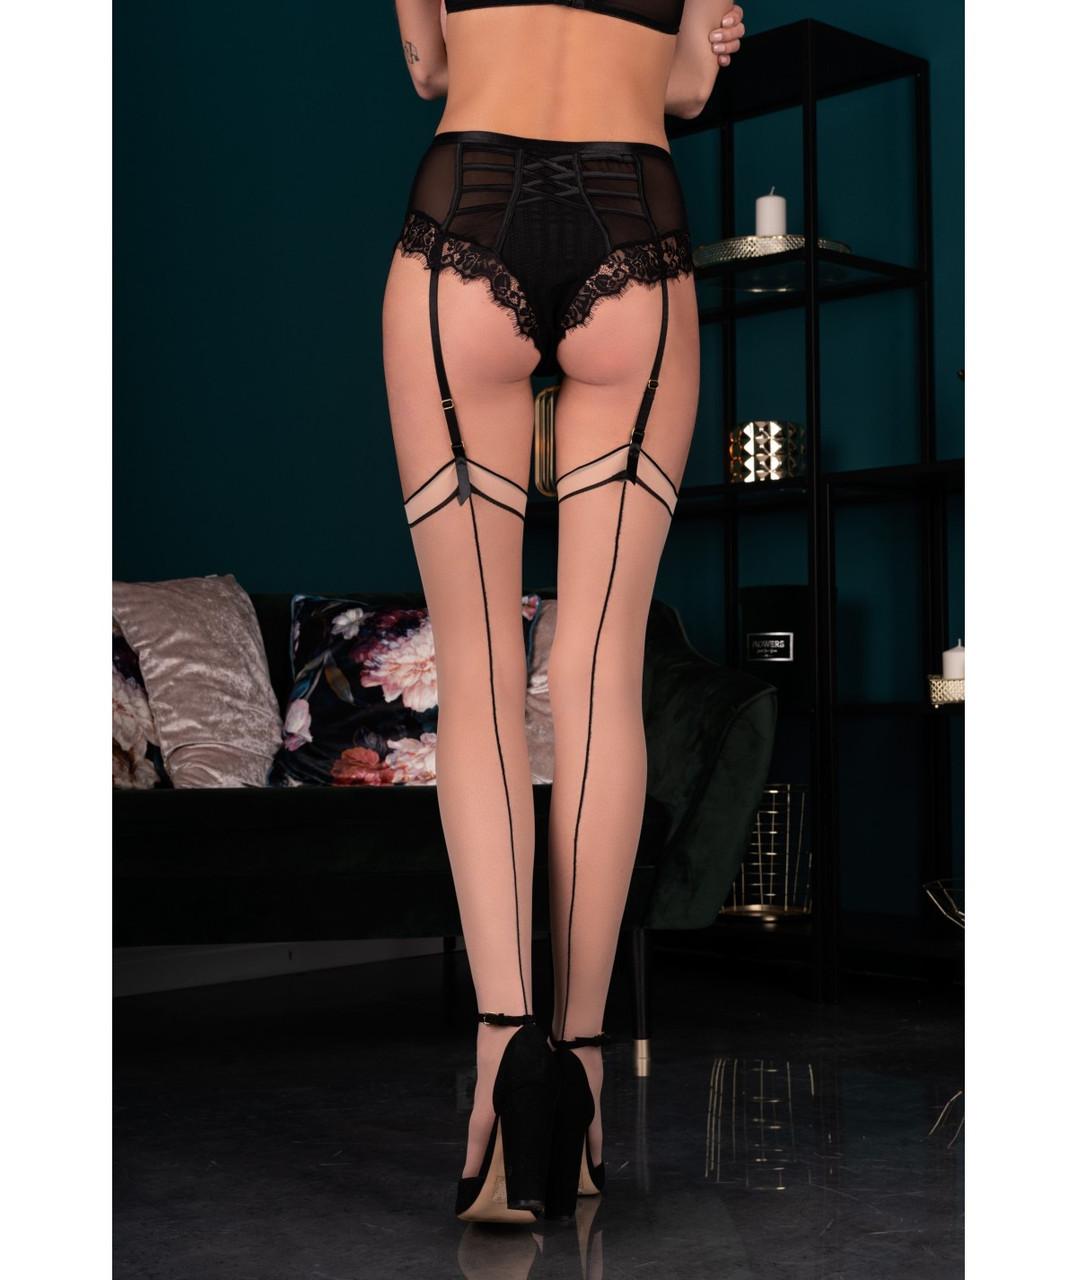 Maramet 20 den панчохи бежево - чорні Livia Corsetti Fashion